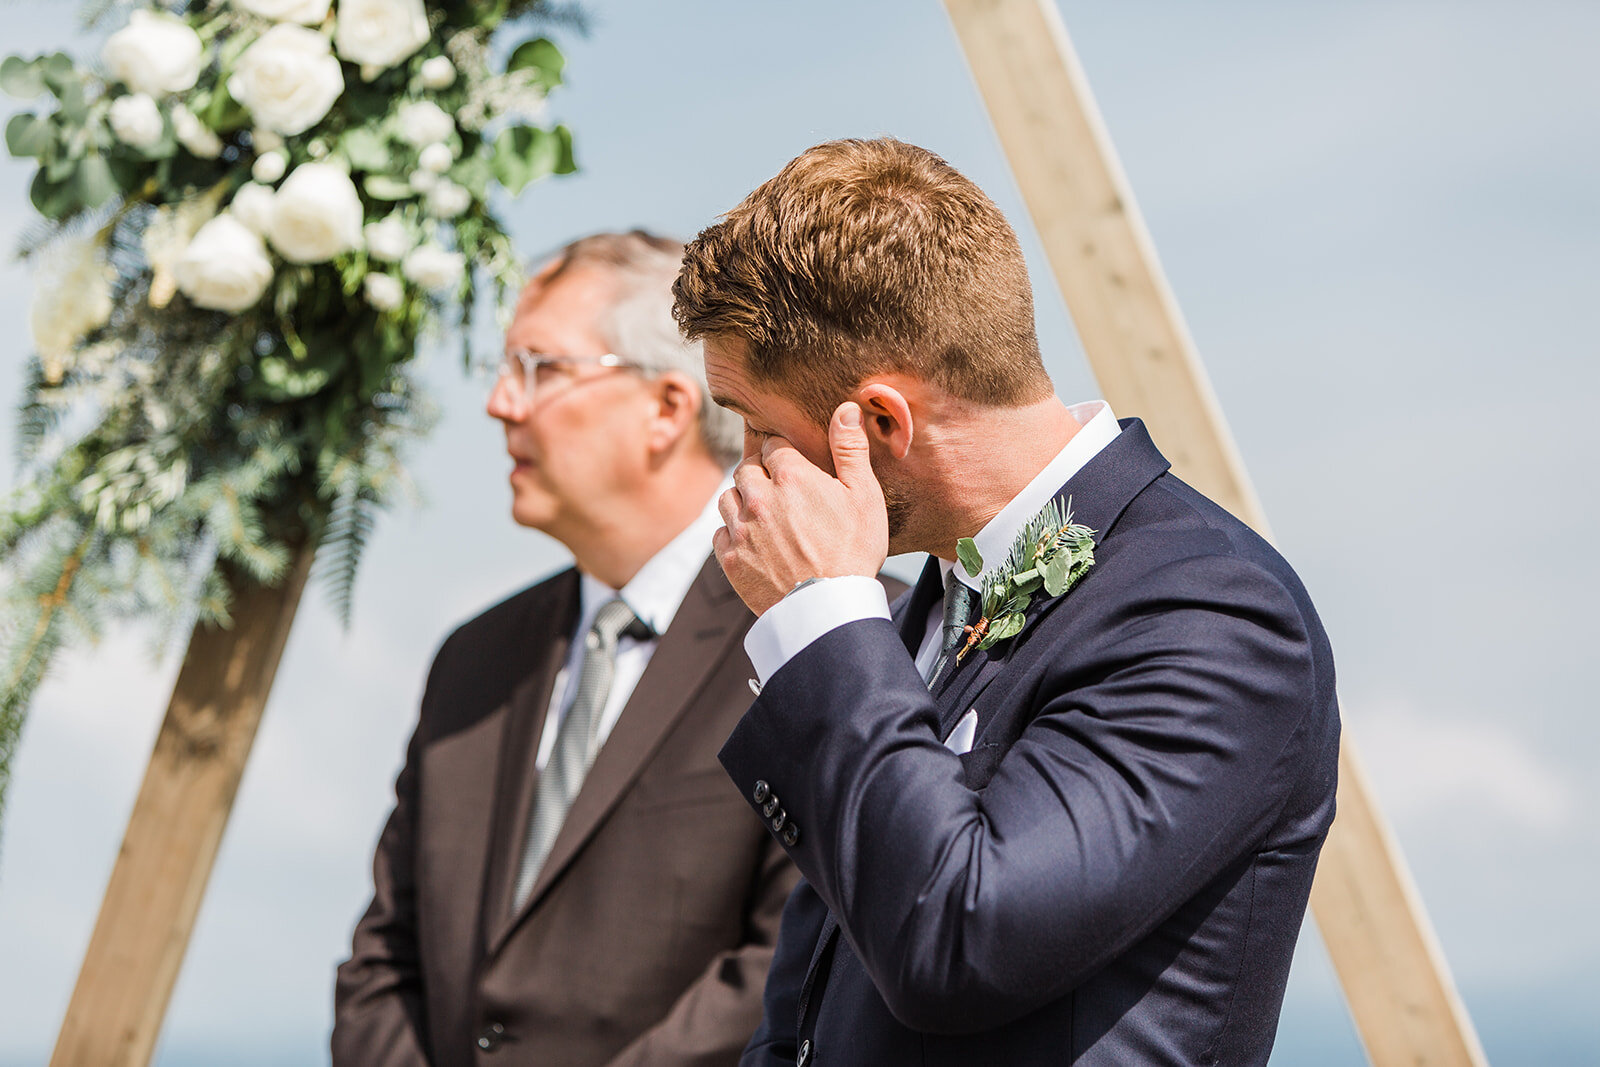 groom first look with spokane bride ceremony wedding